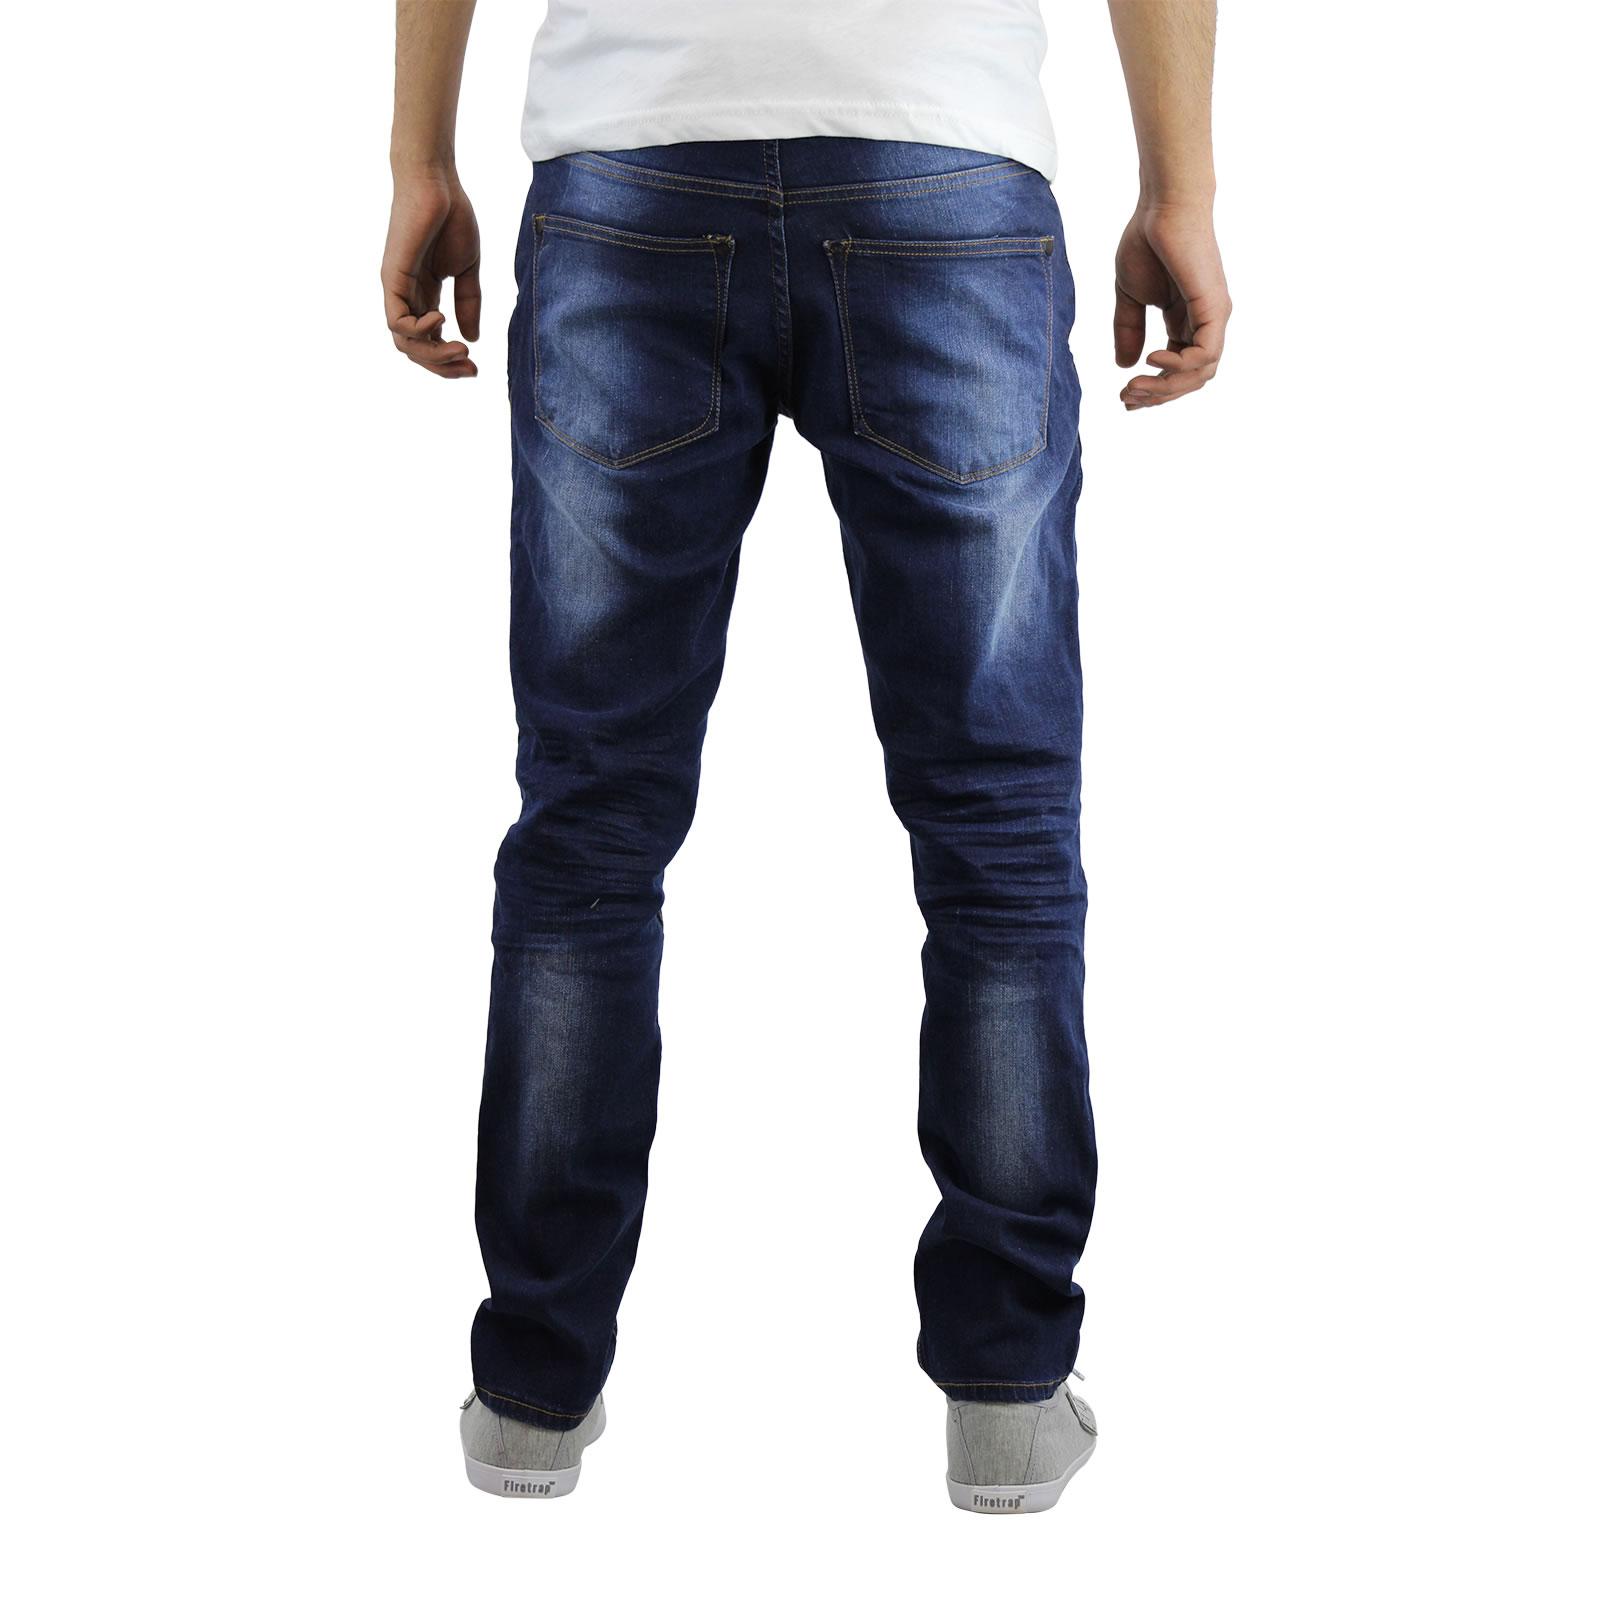 miniature 7 - Homme-Crosshatch-Jaco-Slim-Jeans-stretch-pantalon-denim-effet-vieilli